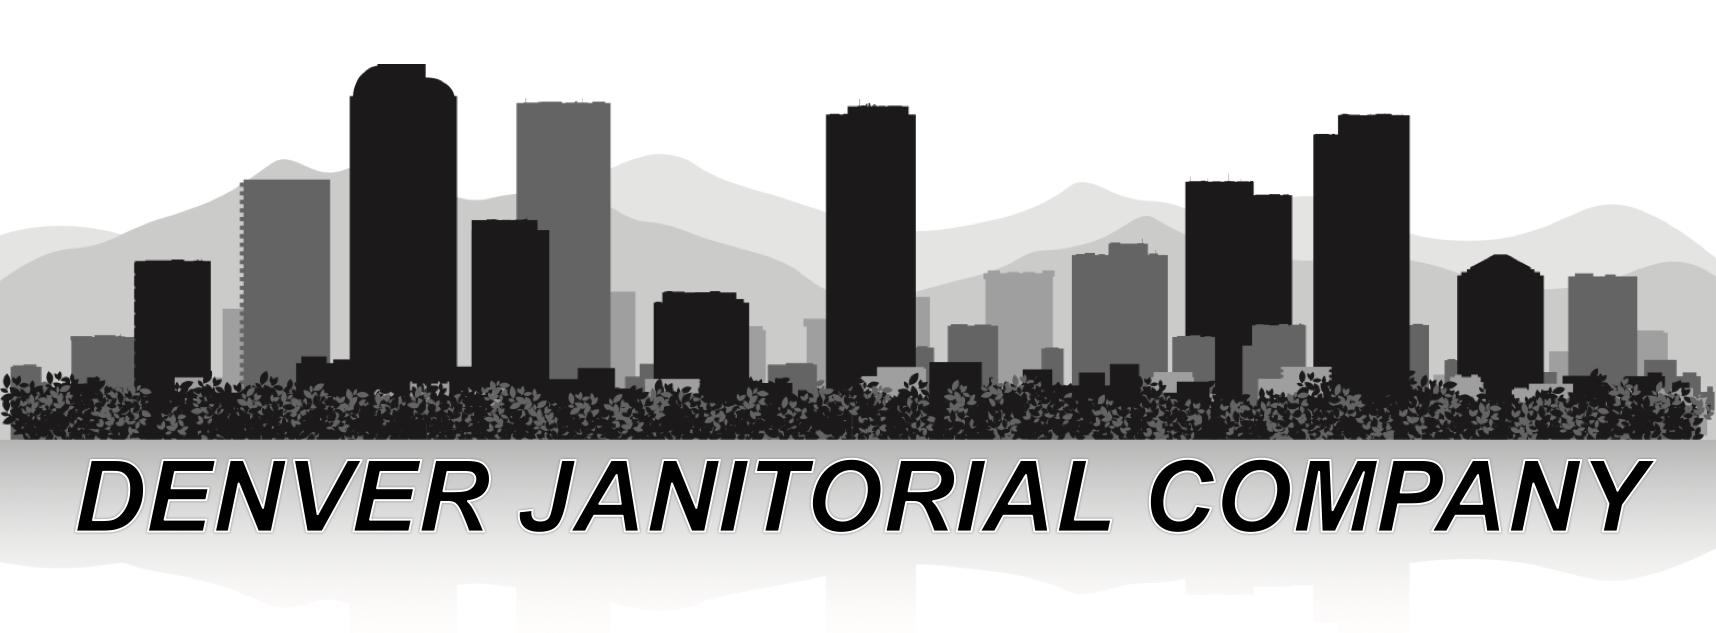 Denver Janitorial Company